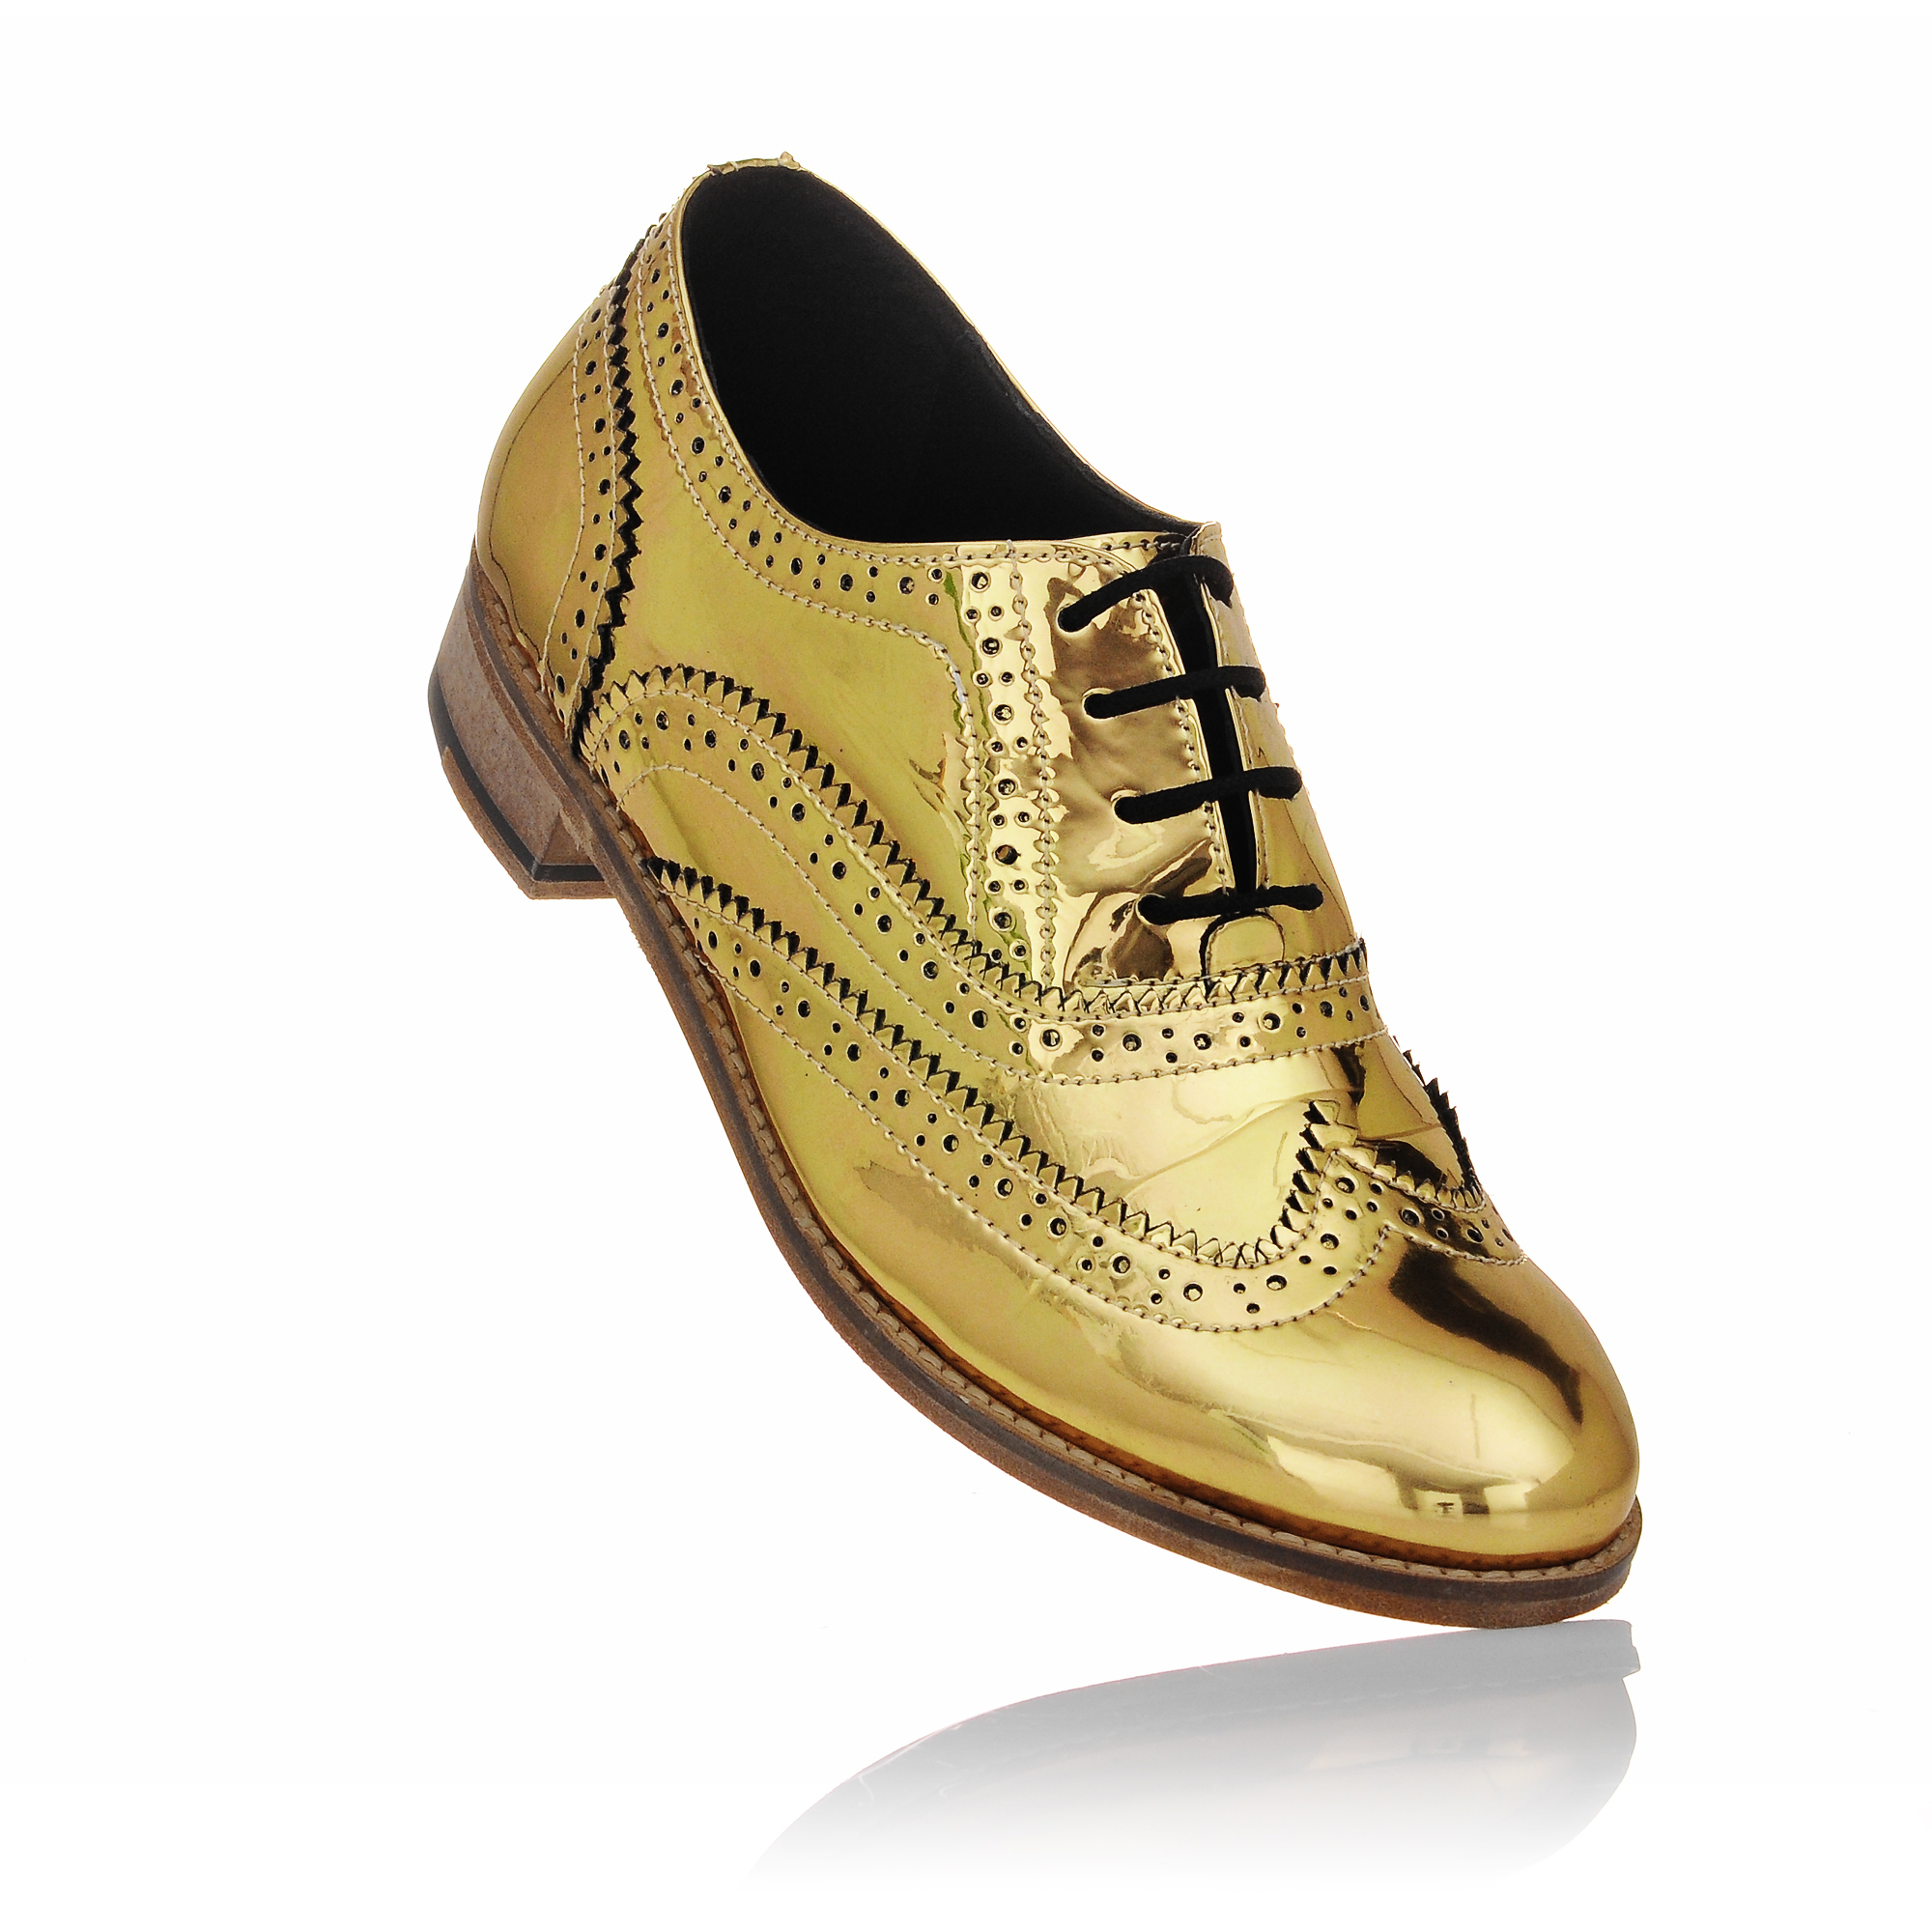 luke grant muller s chrome gold metallic brogue shoes